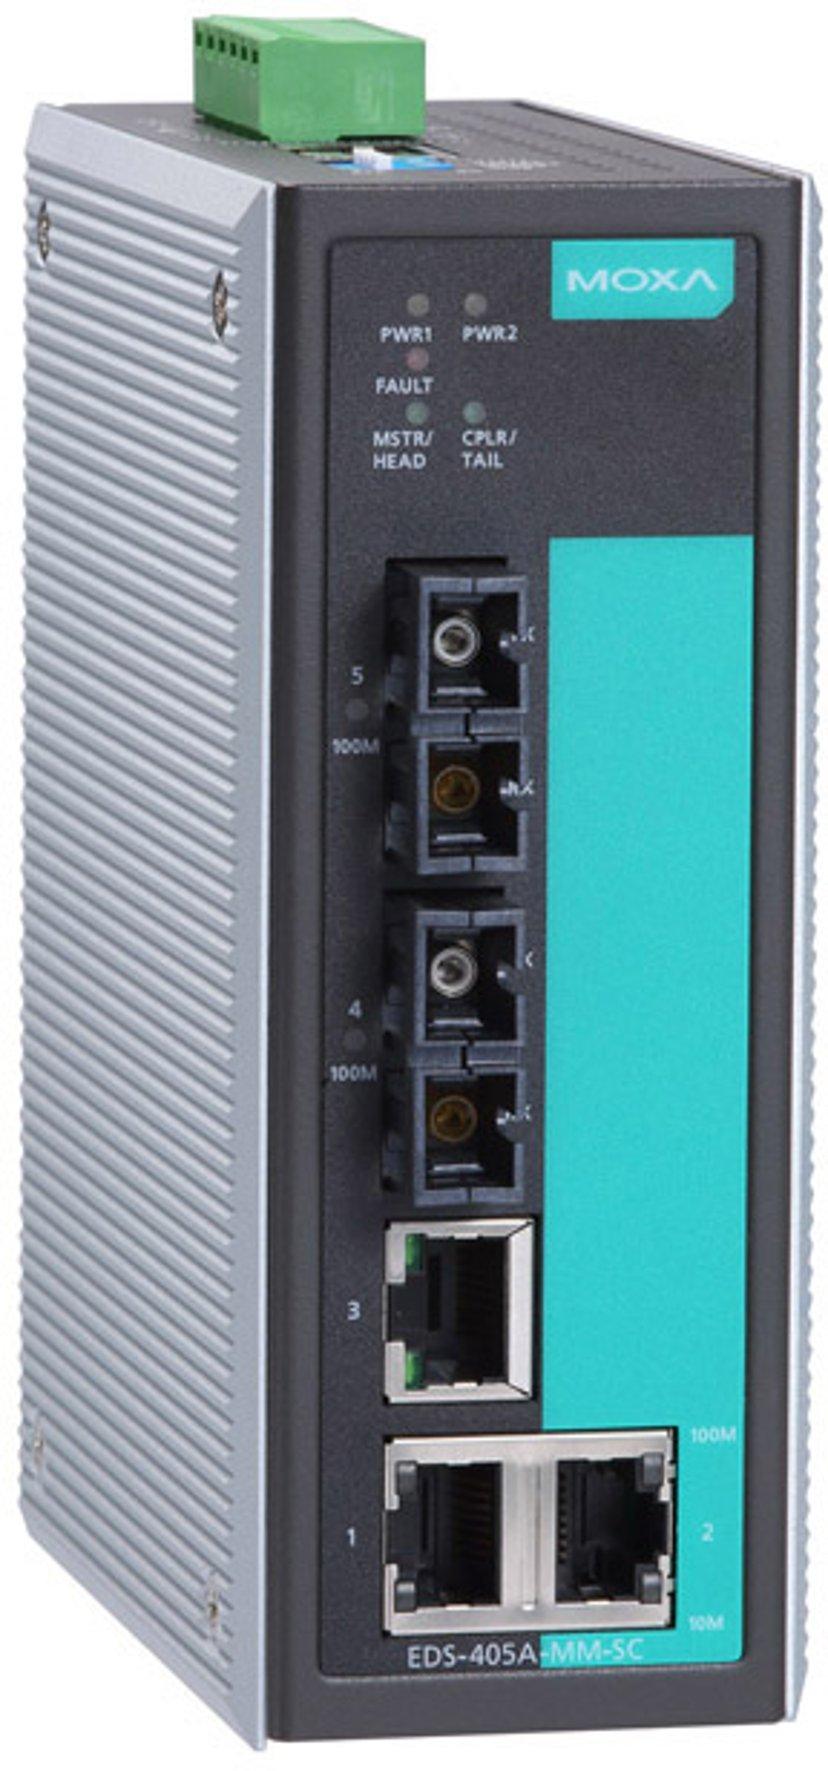 Moxa EDS-405A Industriell Hanterad 5-port Switch